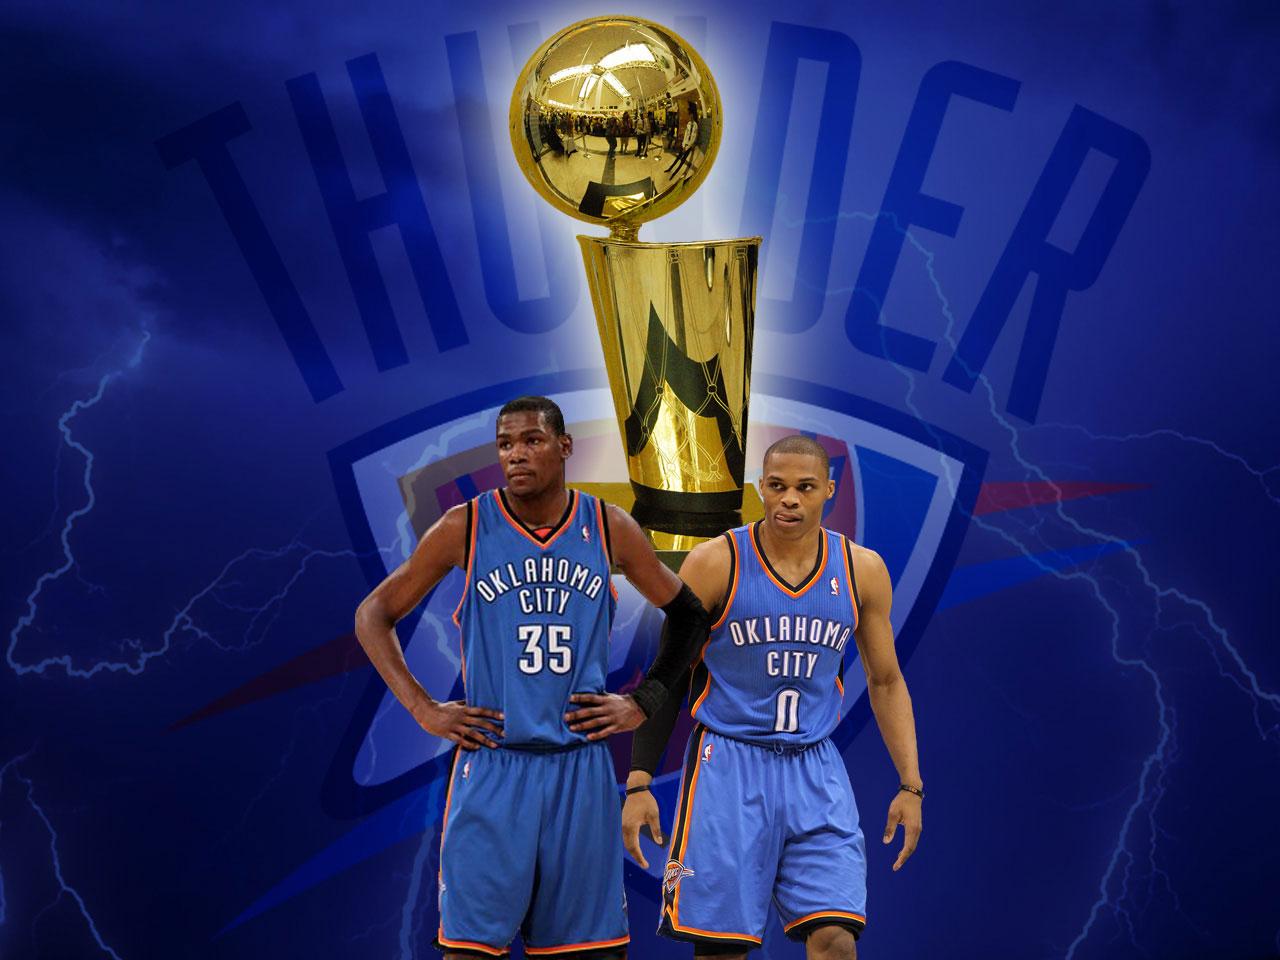 Oklahoma City Thunder NBA Trophy Wallpaper ~ Big Fan of NBA - Daily Update